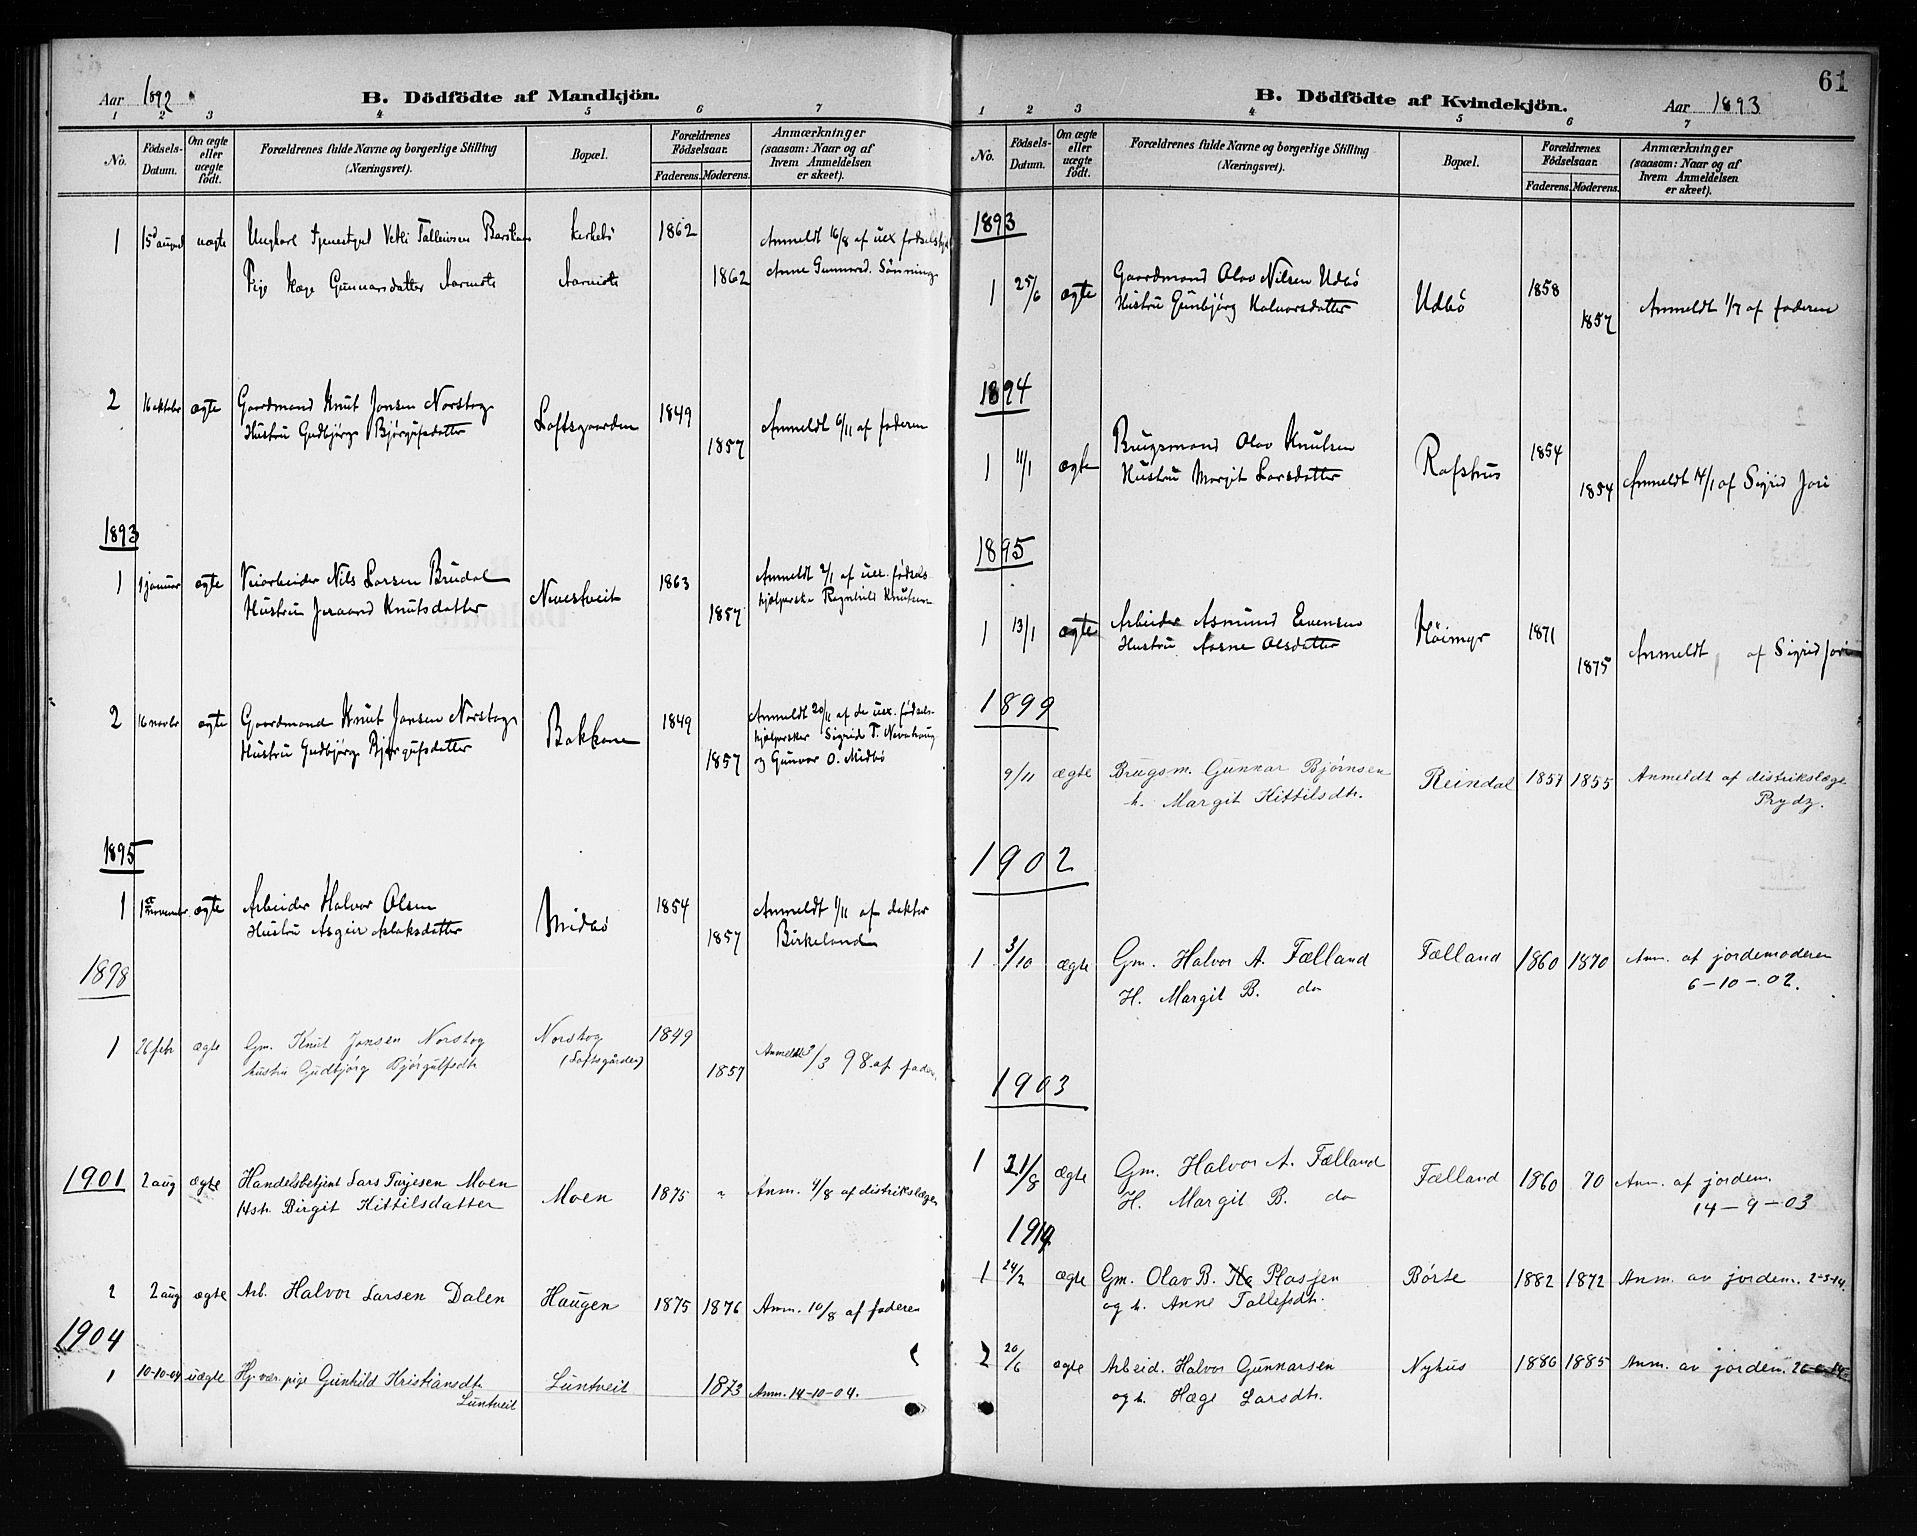 SAKO, Mo kirkebøker, G/Ga/L0002: Klokkerbok nr. I 2, 1892-1914, s. 61